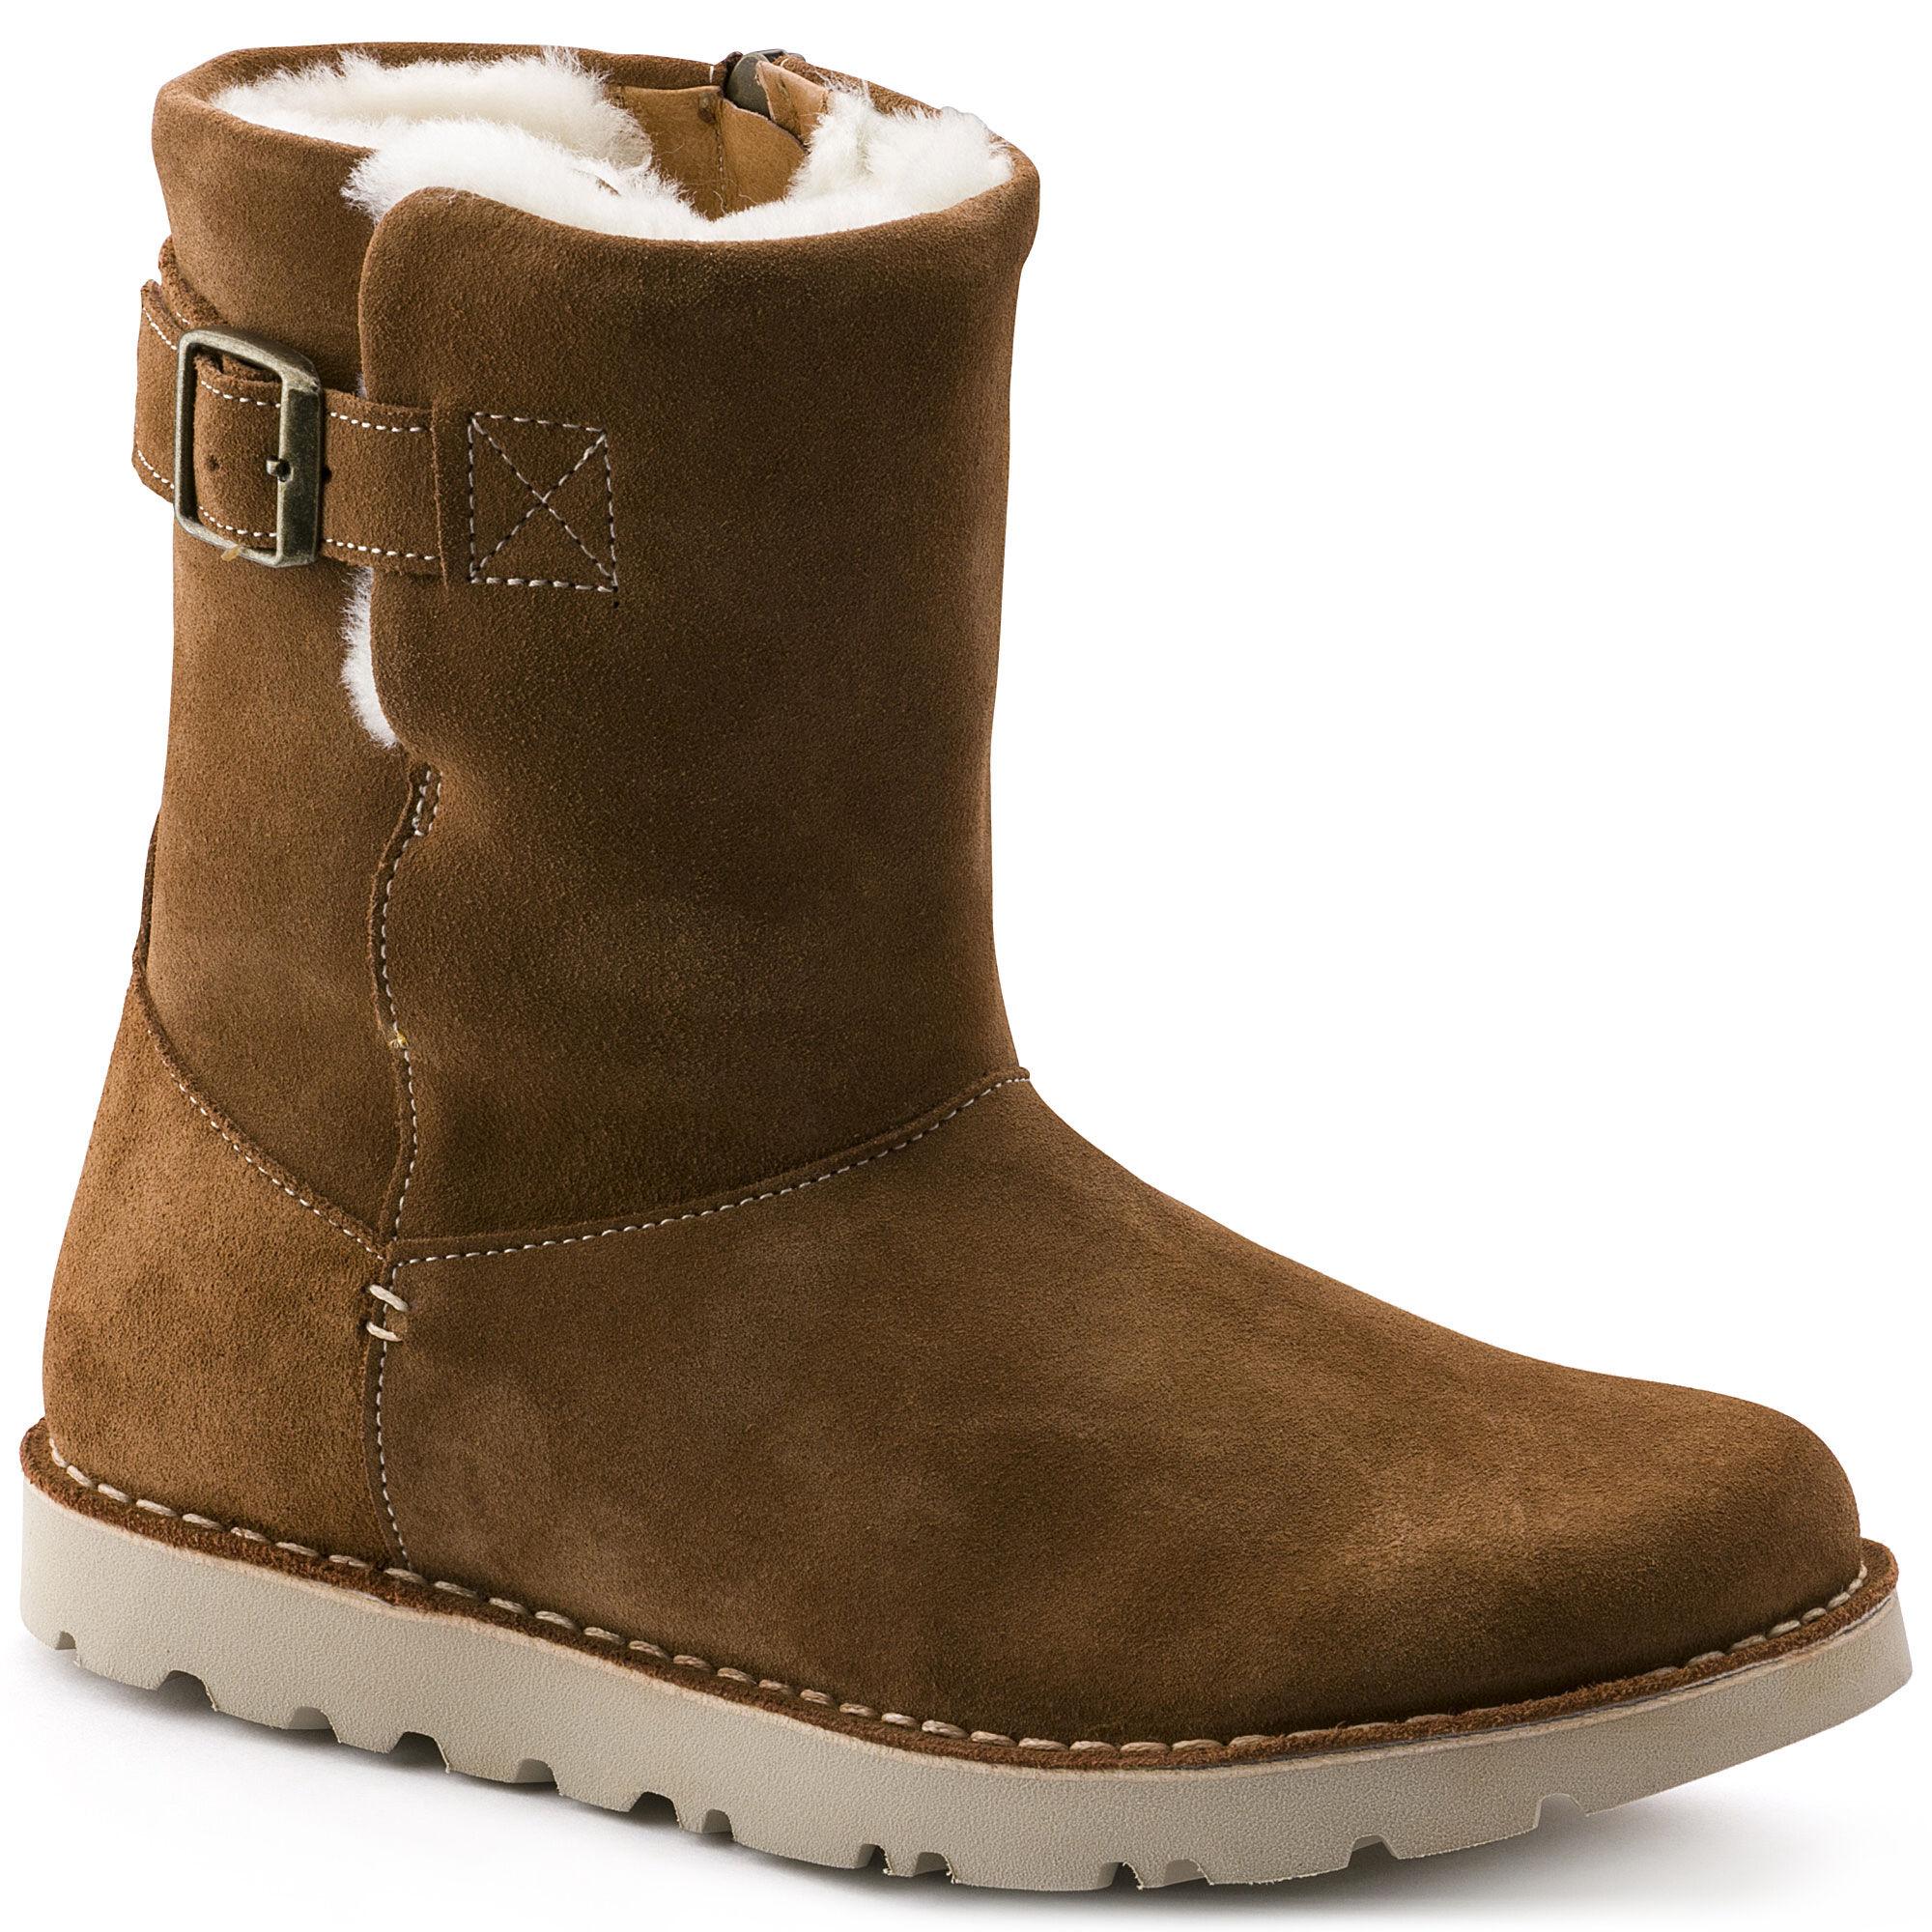 Westford Suede Leather Nut